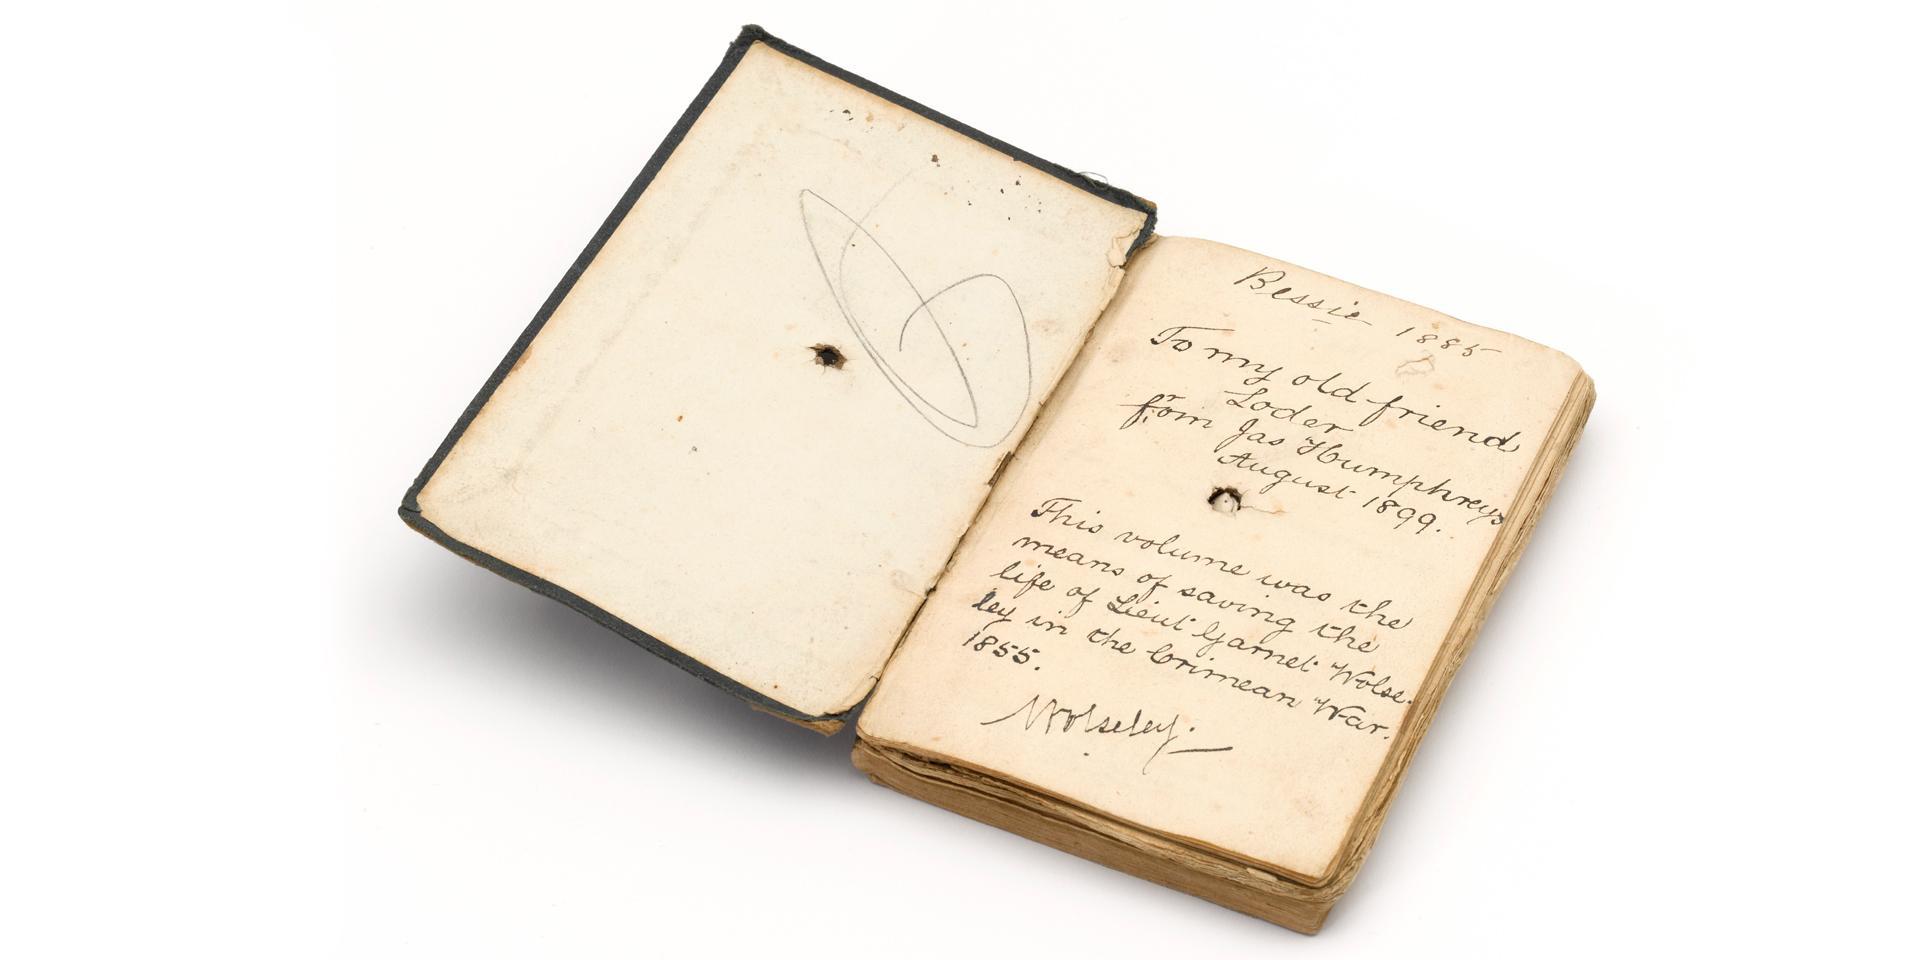 French and English grammar book belonging to Lieutenant Garnet Joseph Wolseley, 1855